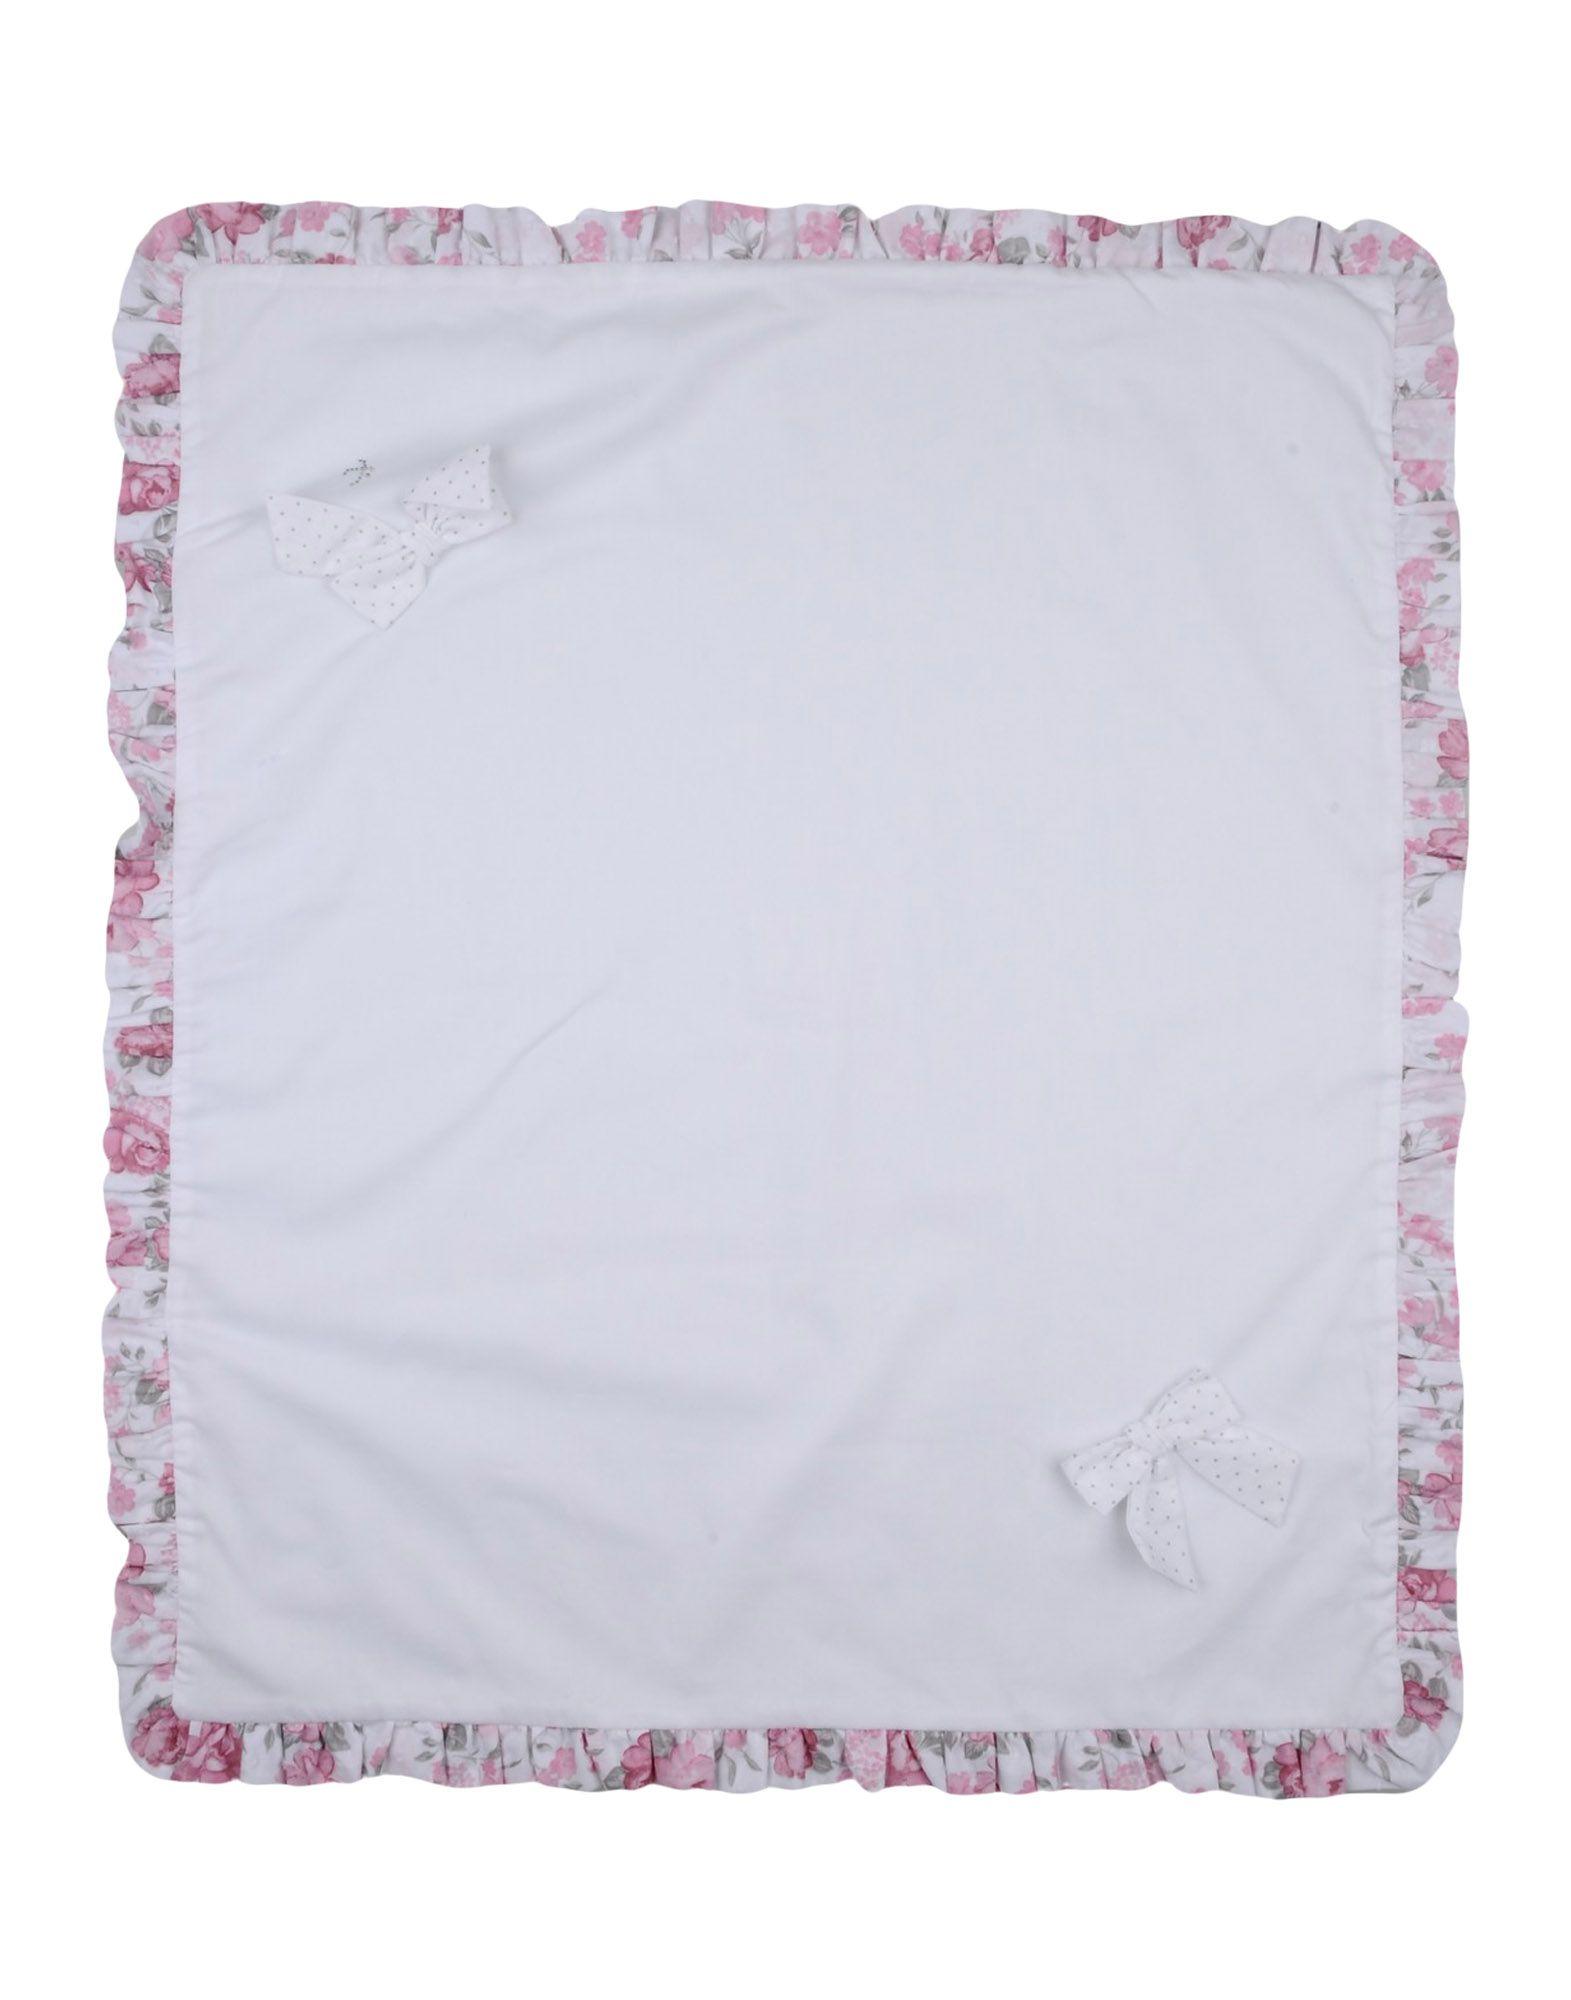 Perdipiù Одеяльце для младенцев круг для купания младенцев flipper отзывы